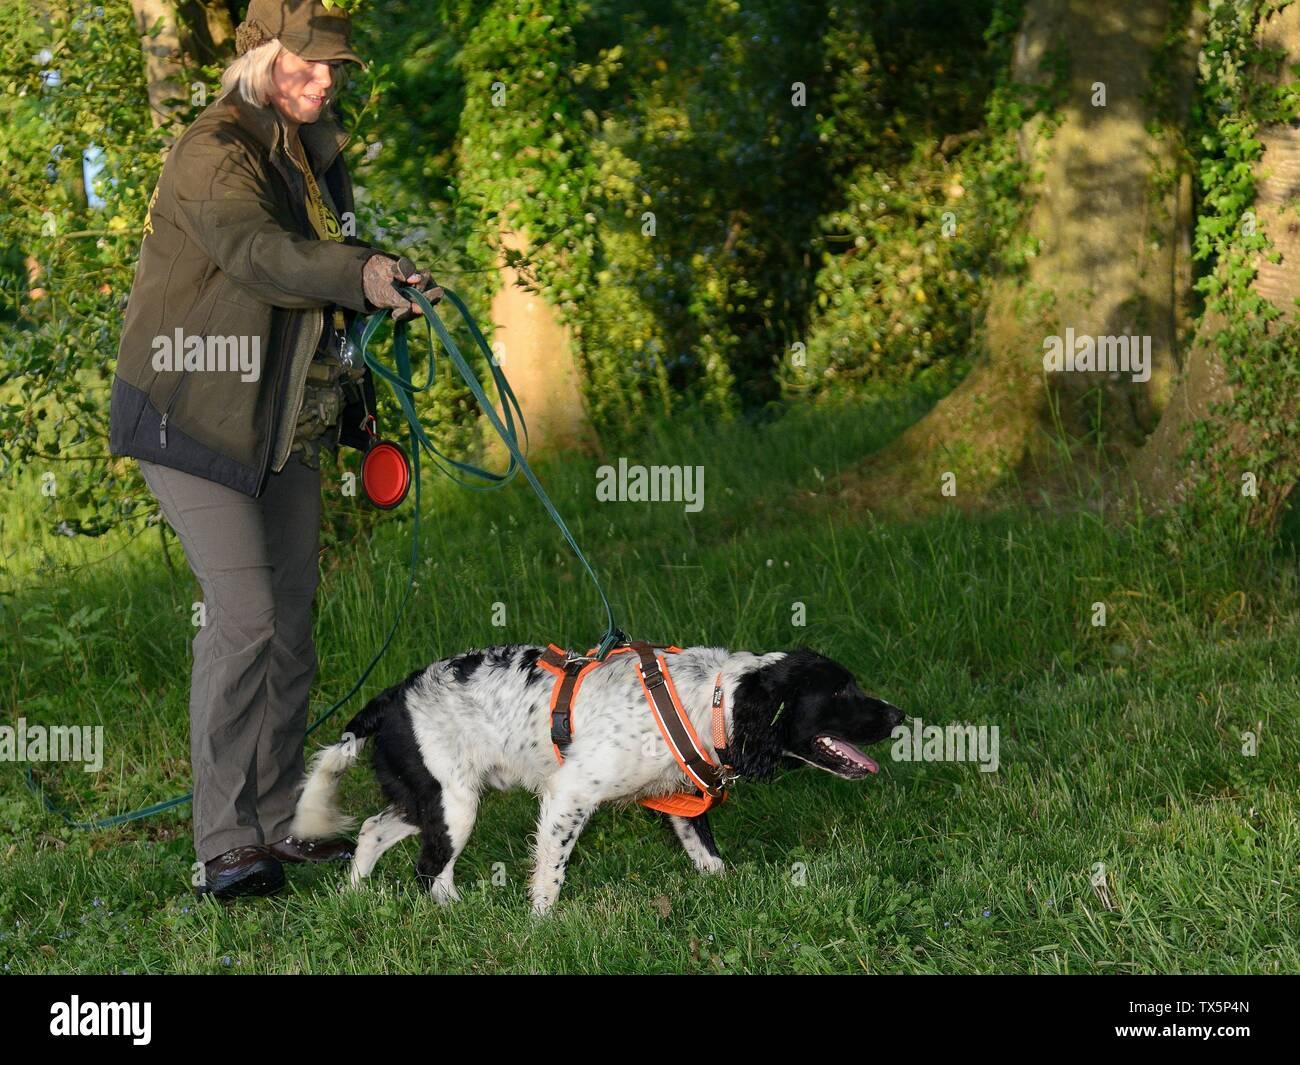 Sniffer dog searching for Hedgehogs (Erinaceus europaeus) hidden in nests, Hartpury University, Gloucestrshire, UK, June. - Stock Image